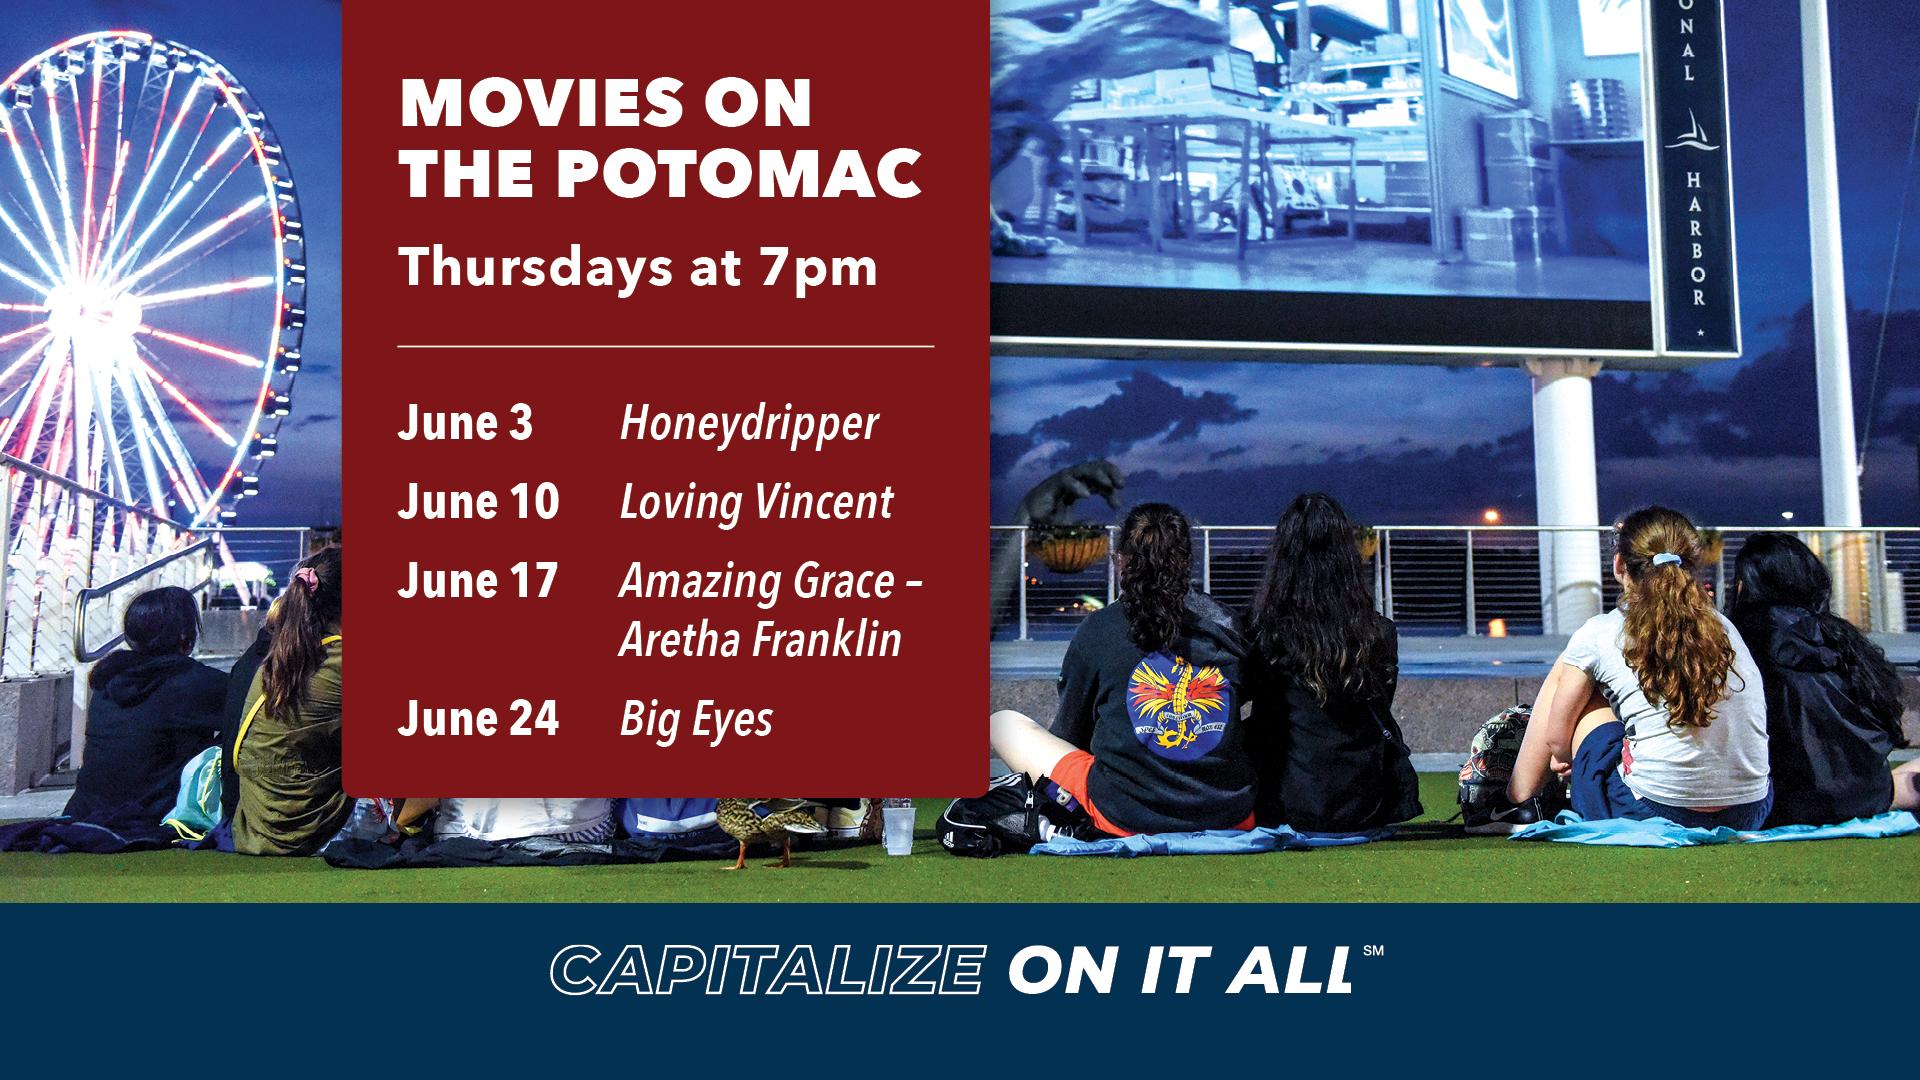 Movies on the Potomac-Big Eyes